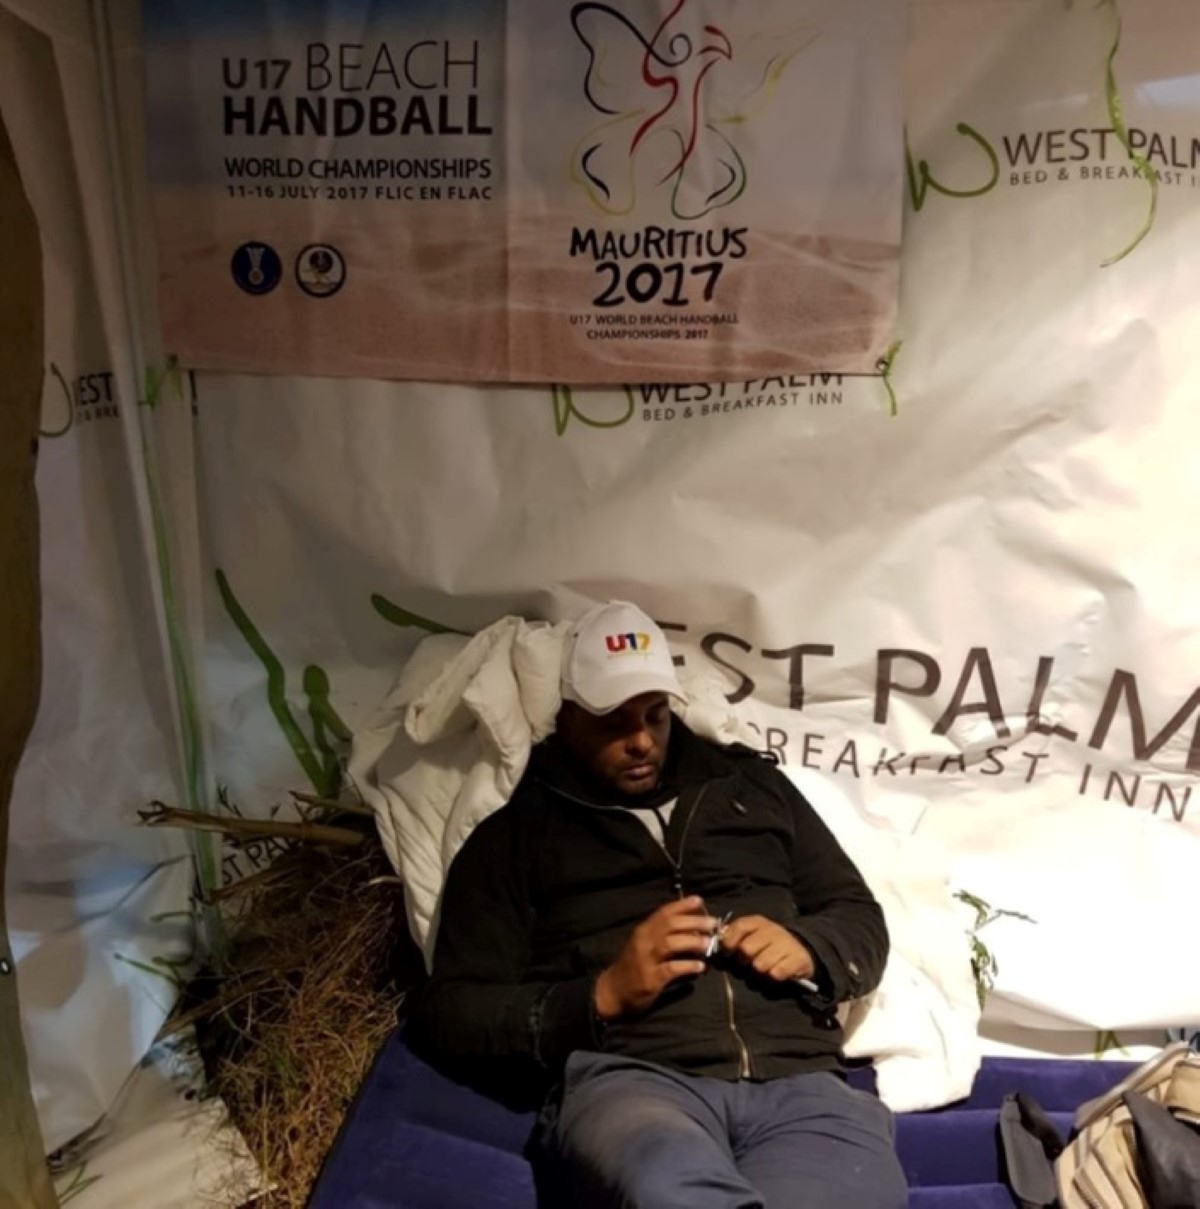 11e jour de grève de la faim : Gerald Alcindor proteste contre la Mauritius Handball Association